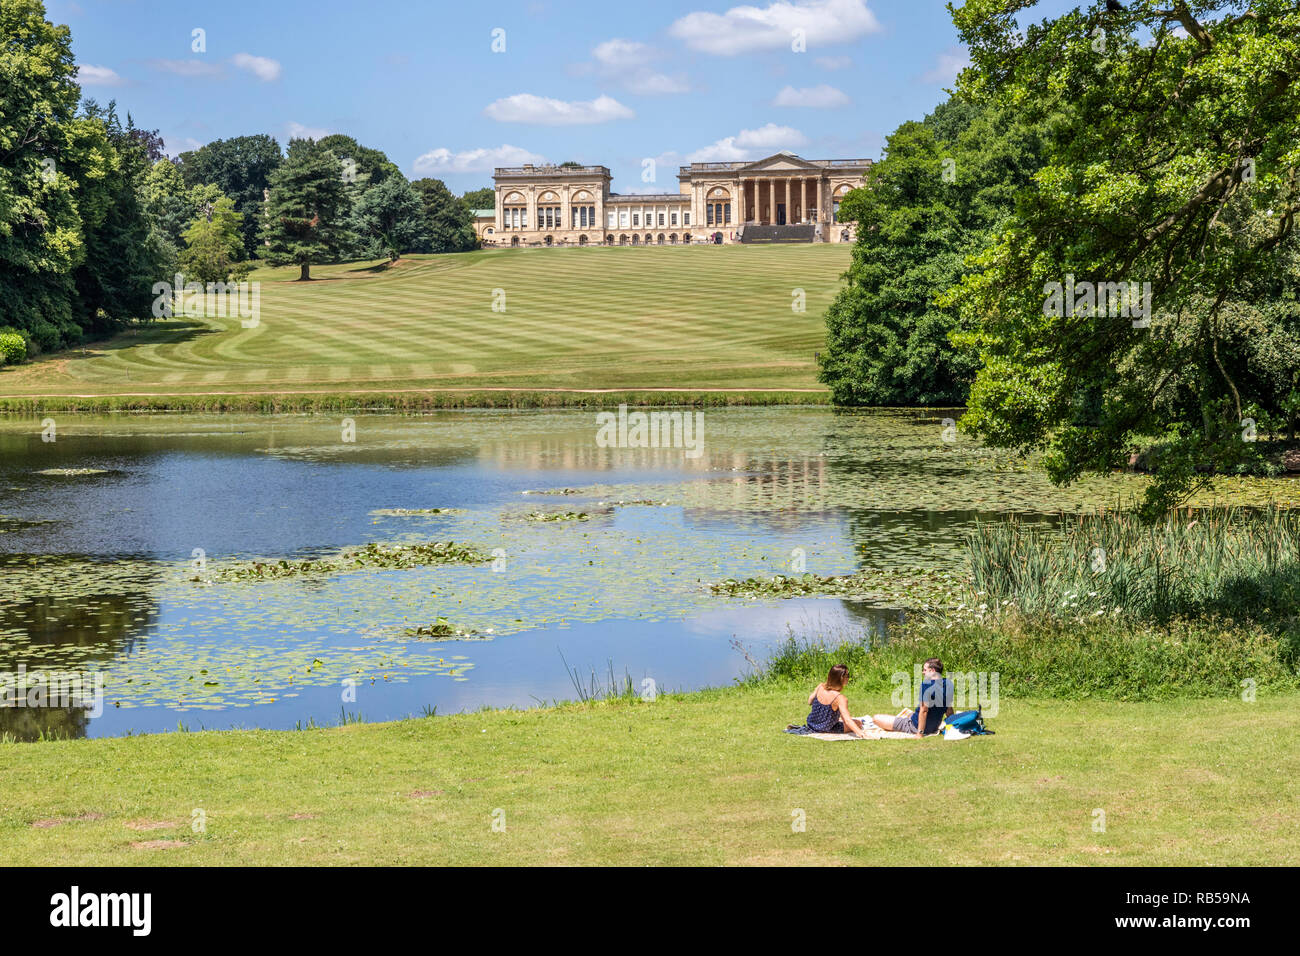 A young couple enjoying a picnic beside the lake at Stowe House Gardens, Buckinghamshire UK - Stock Image